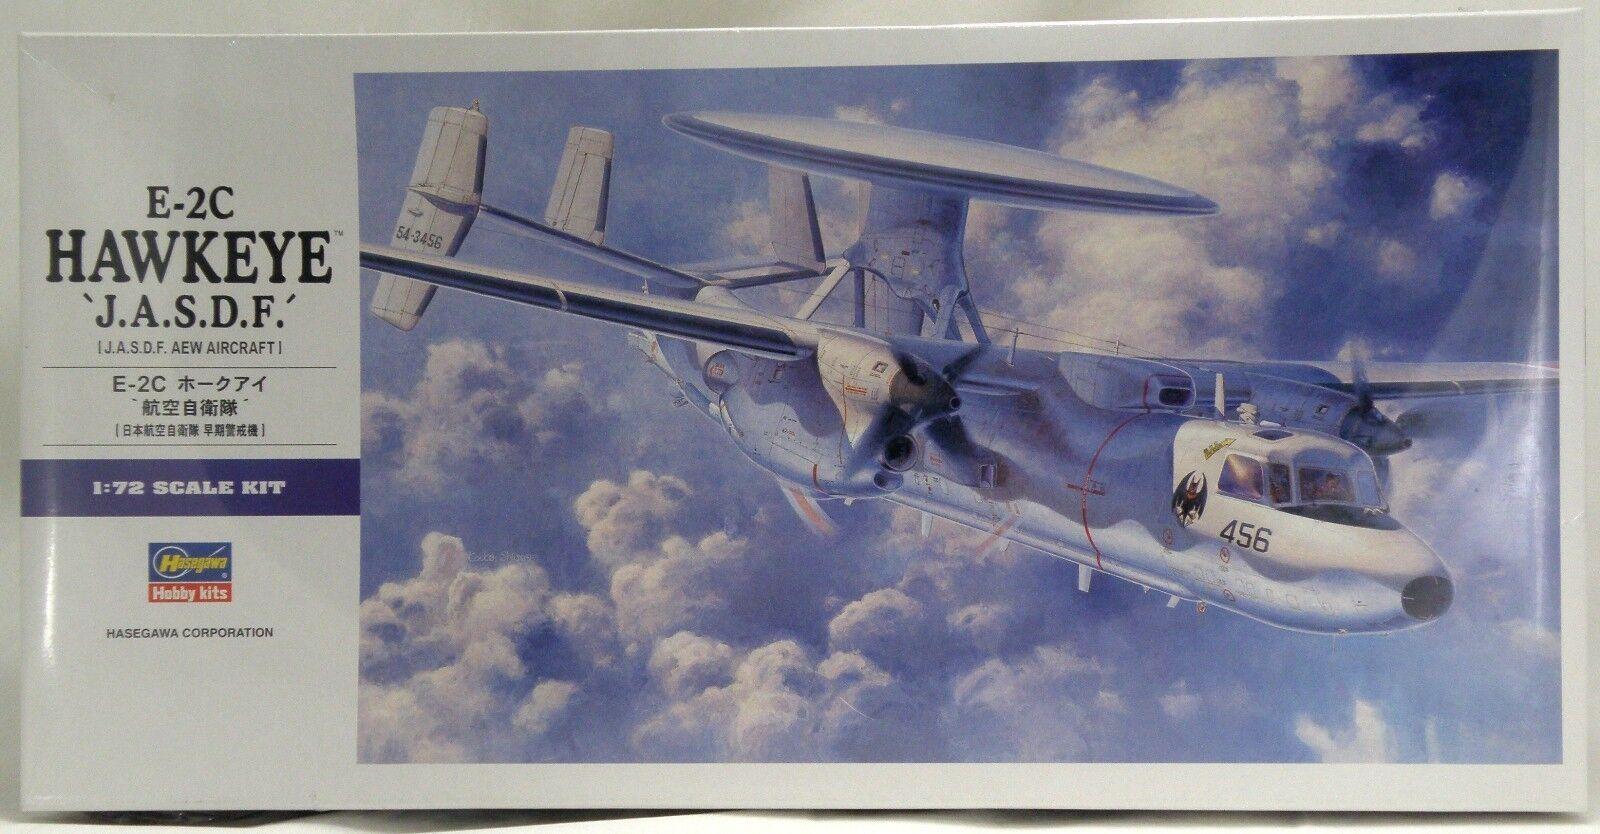 1 72 Scale E-2C Hawkeye 'J.A.S.D.F.' Model Aircraft Kit - Hasegawa